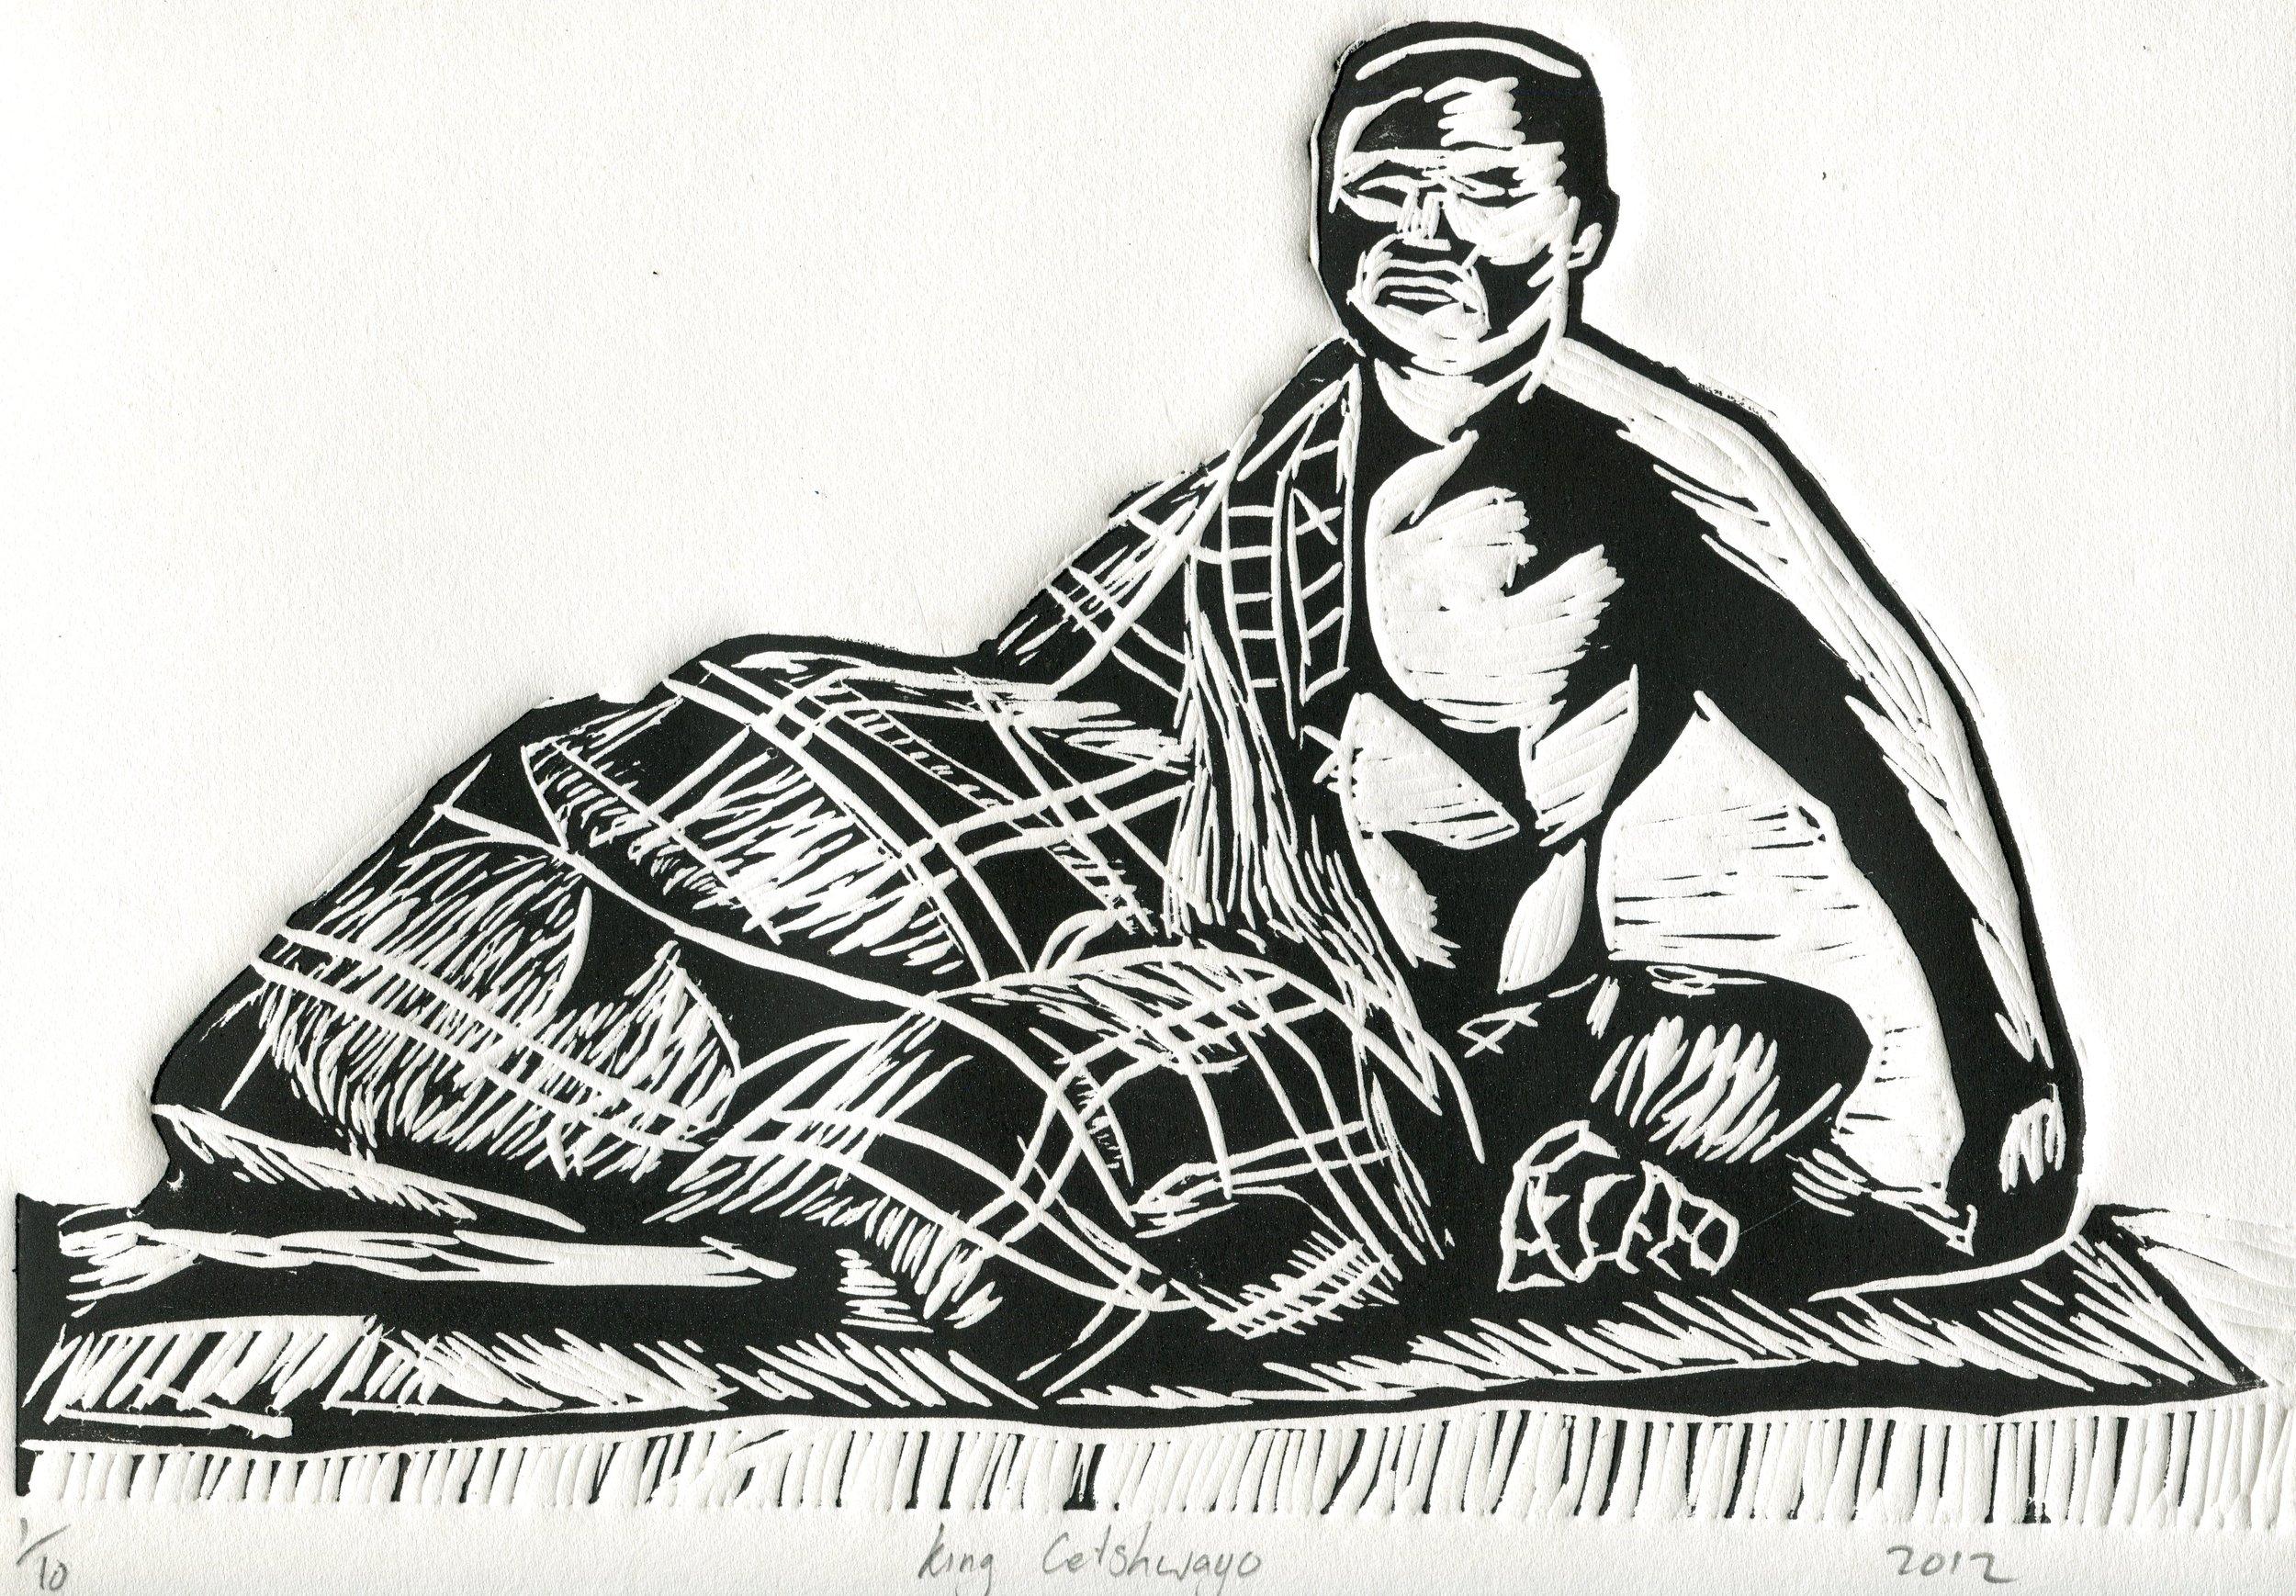 04c  Siyabonga Ngubane  King Cetshwayo  linocut print on paper